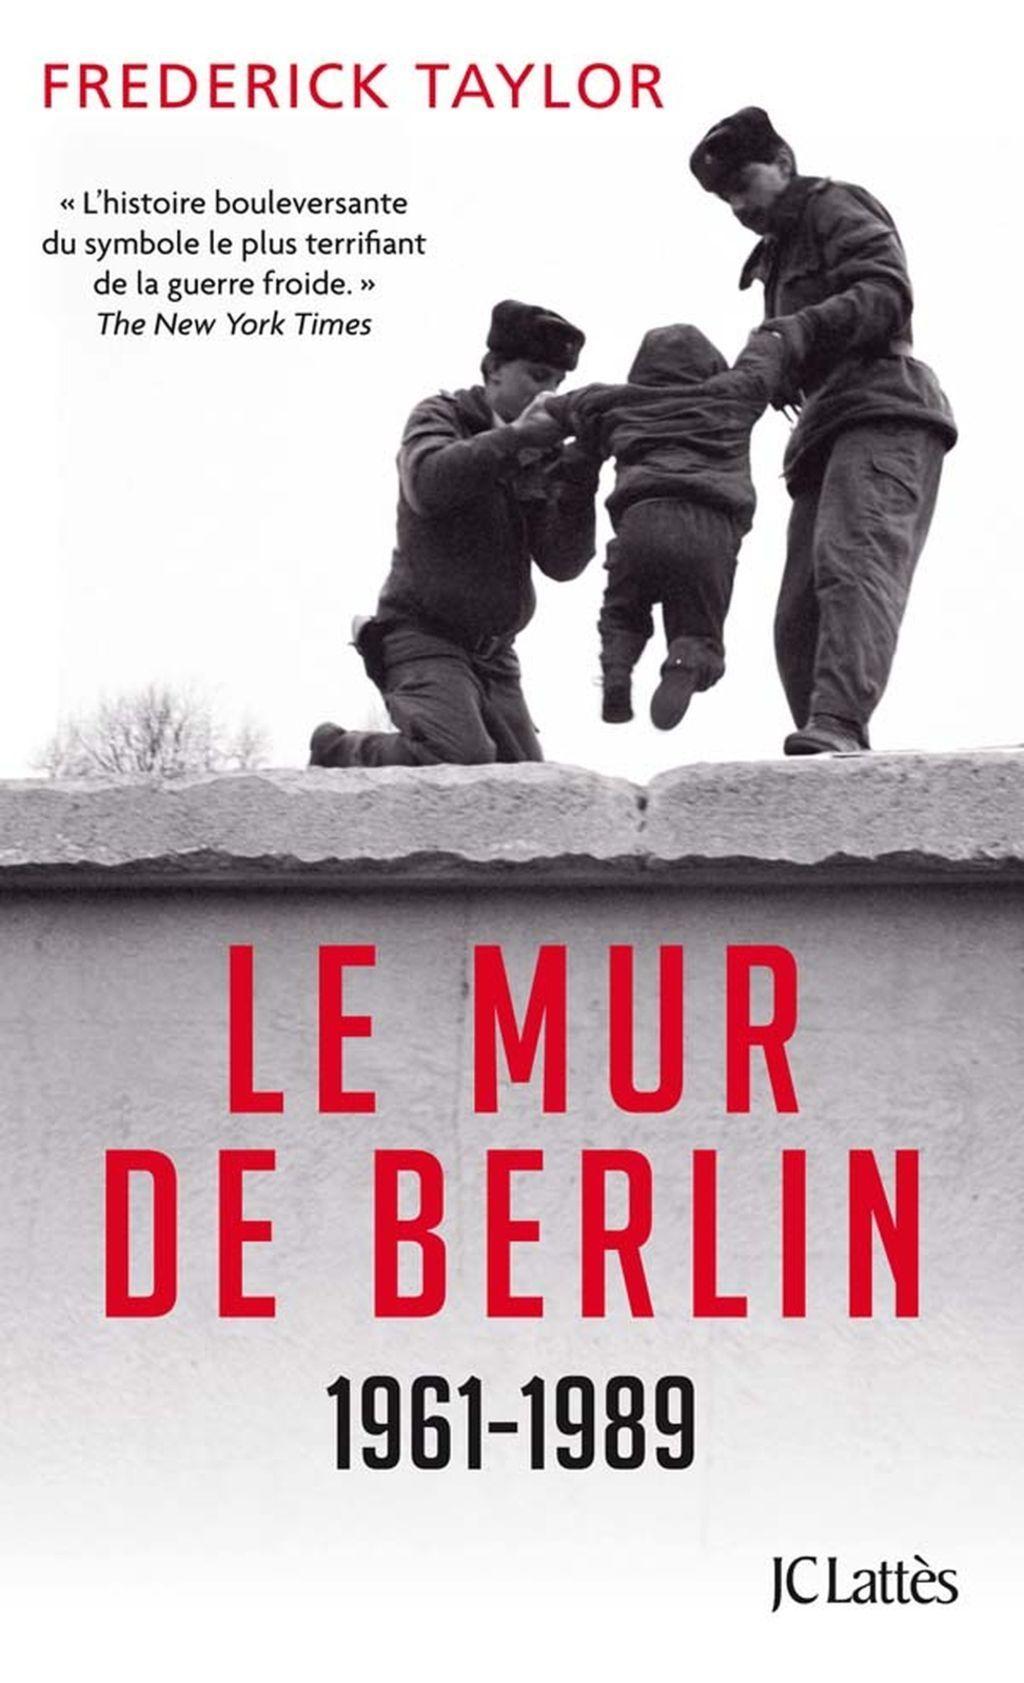 Le Mur de Berlin (eBook) #murdeberlin Le Mur de Berlin (eBook) #murdeberlin Le Mur de Berlin (eBook) #murdeberlin Le Mur de Berlin (eBook) #murdeberlin